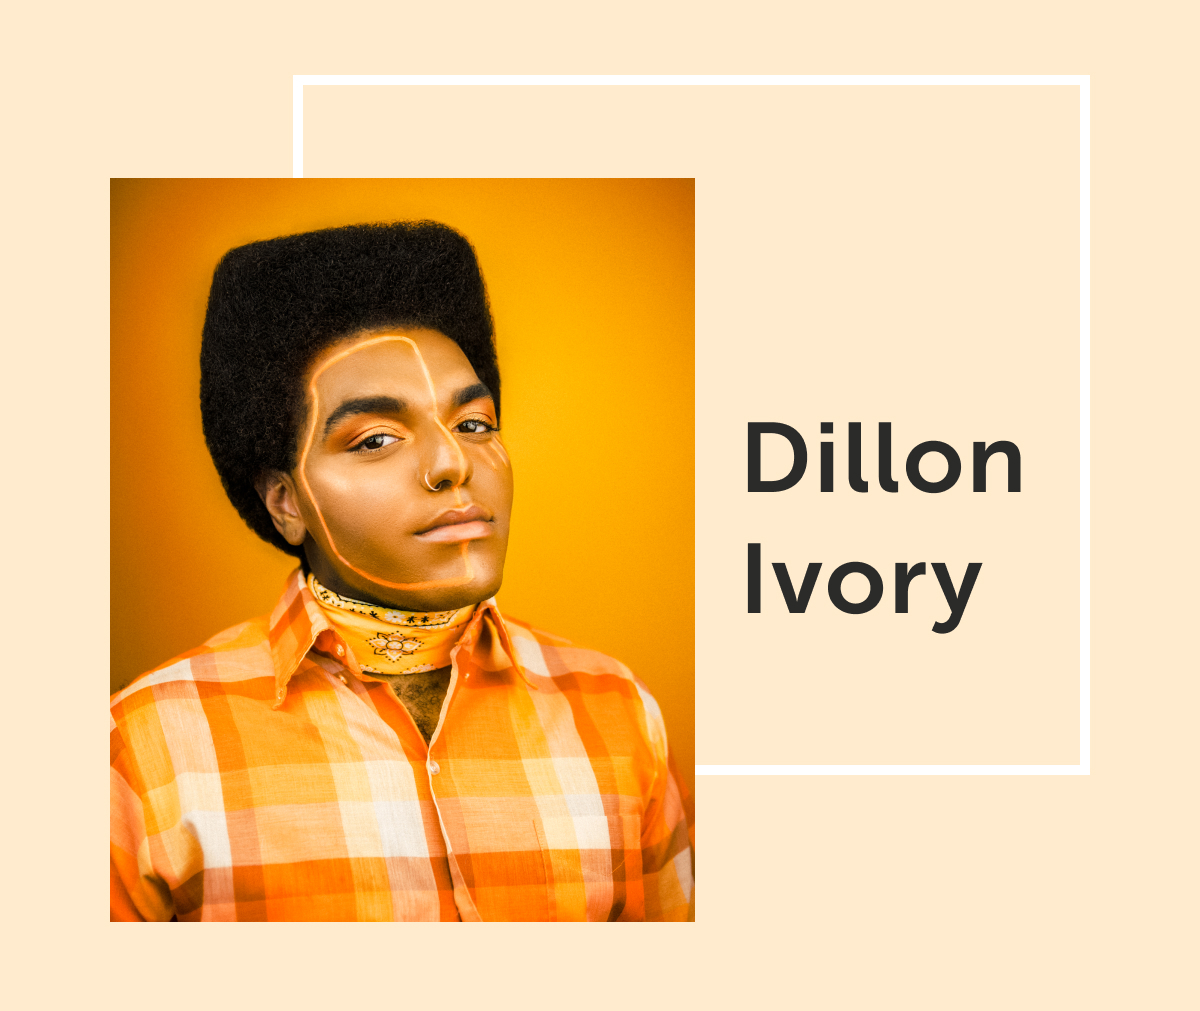 Dillon Ivory bio image